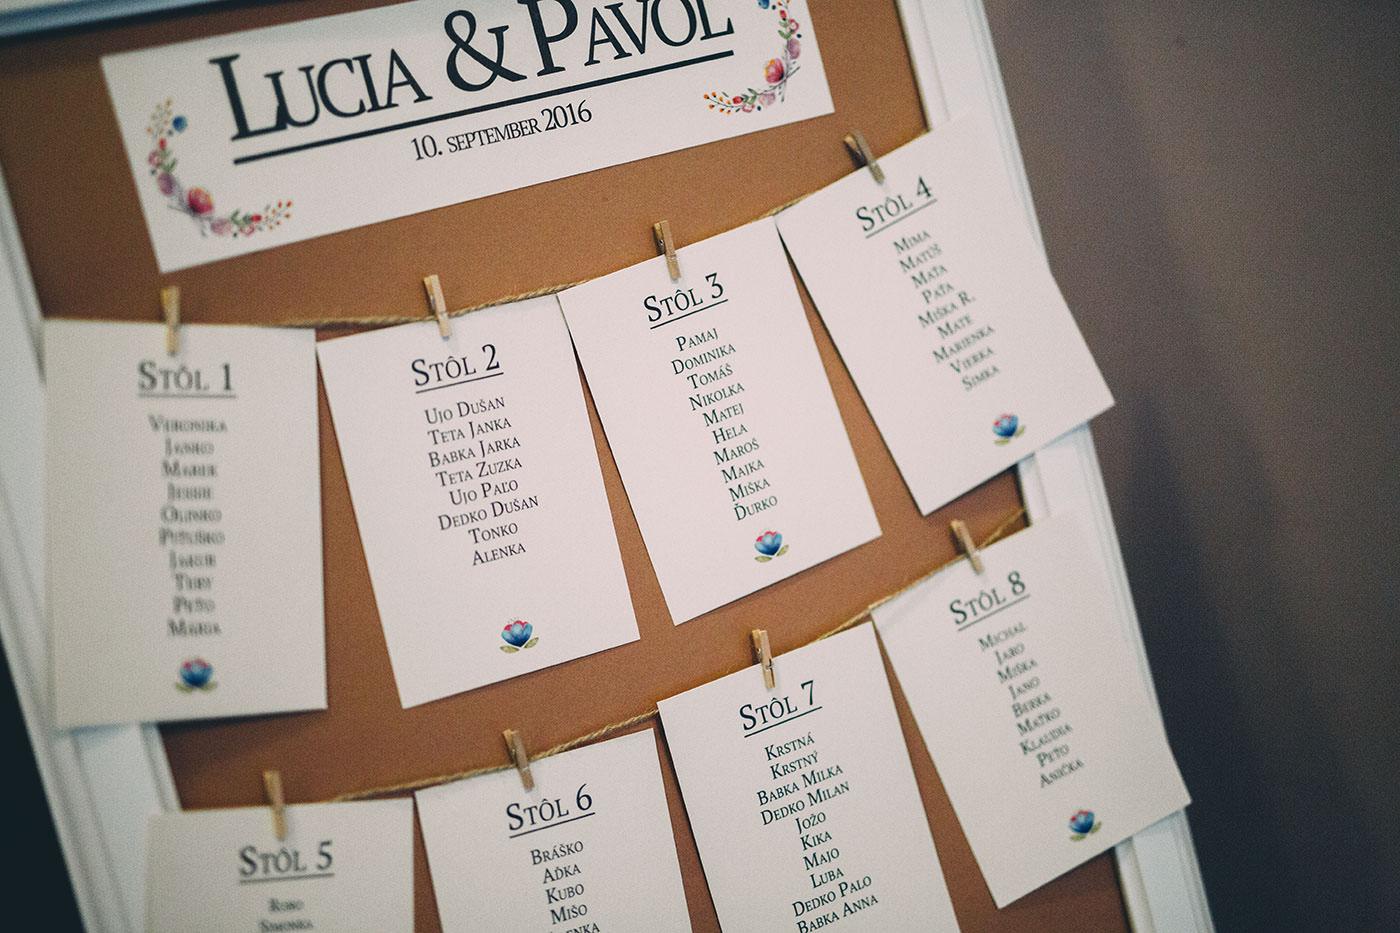 Lucia a Pavol 0528